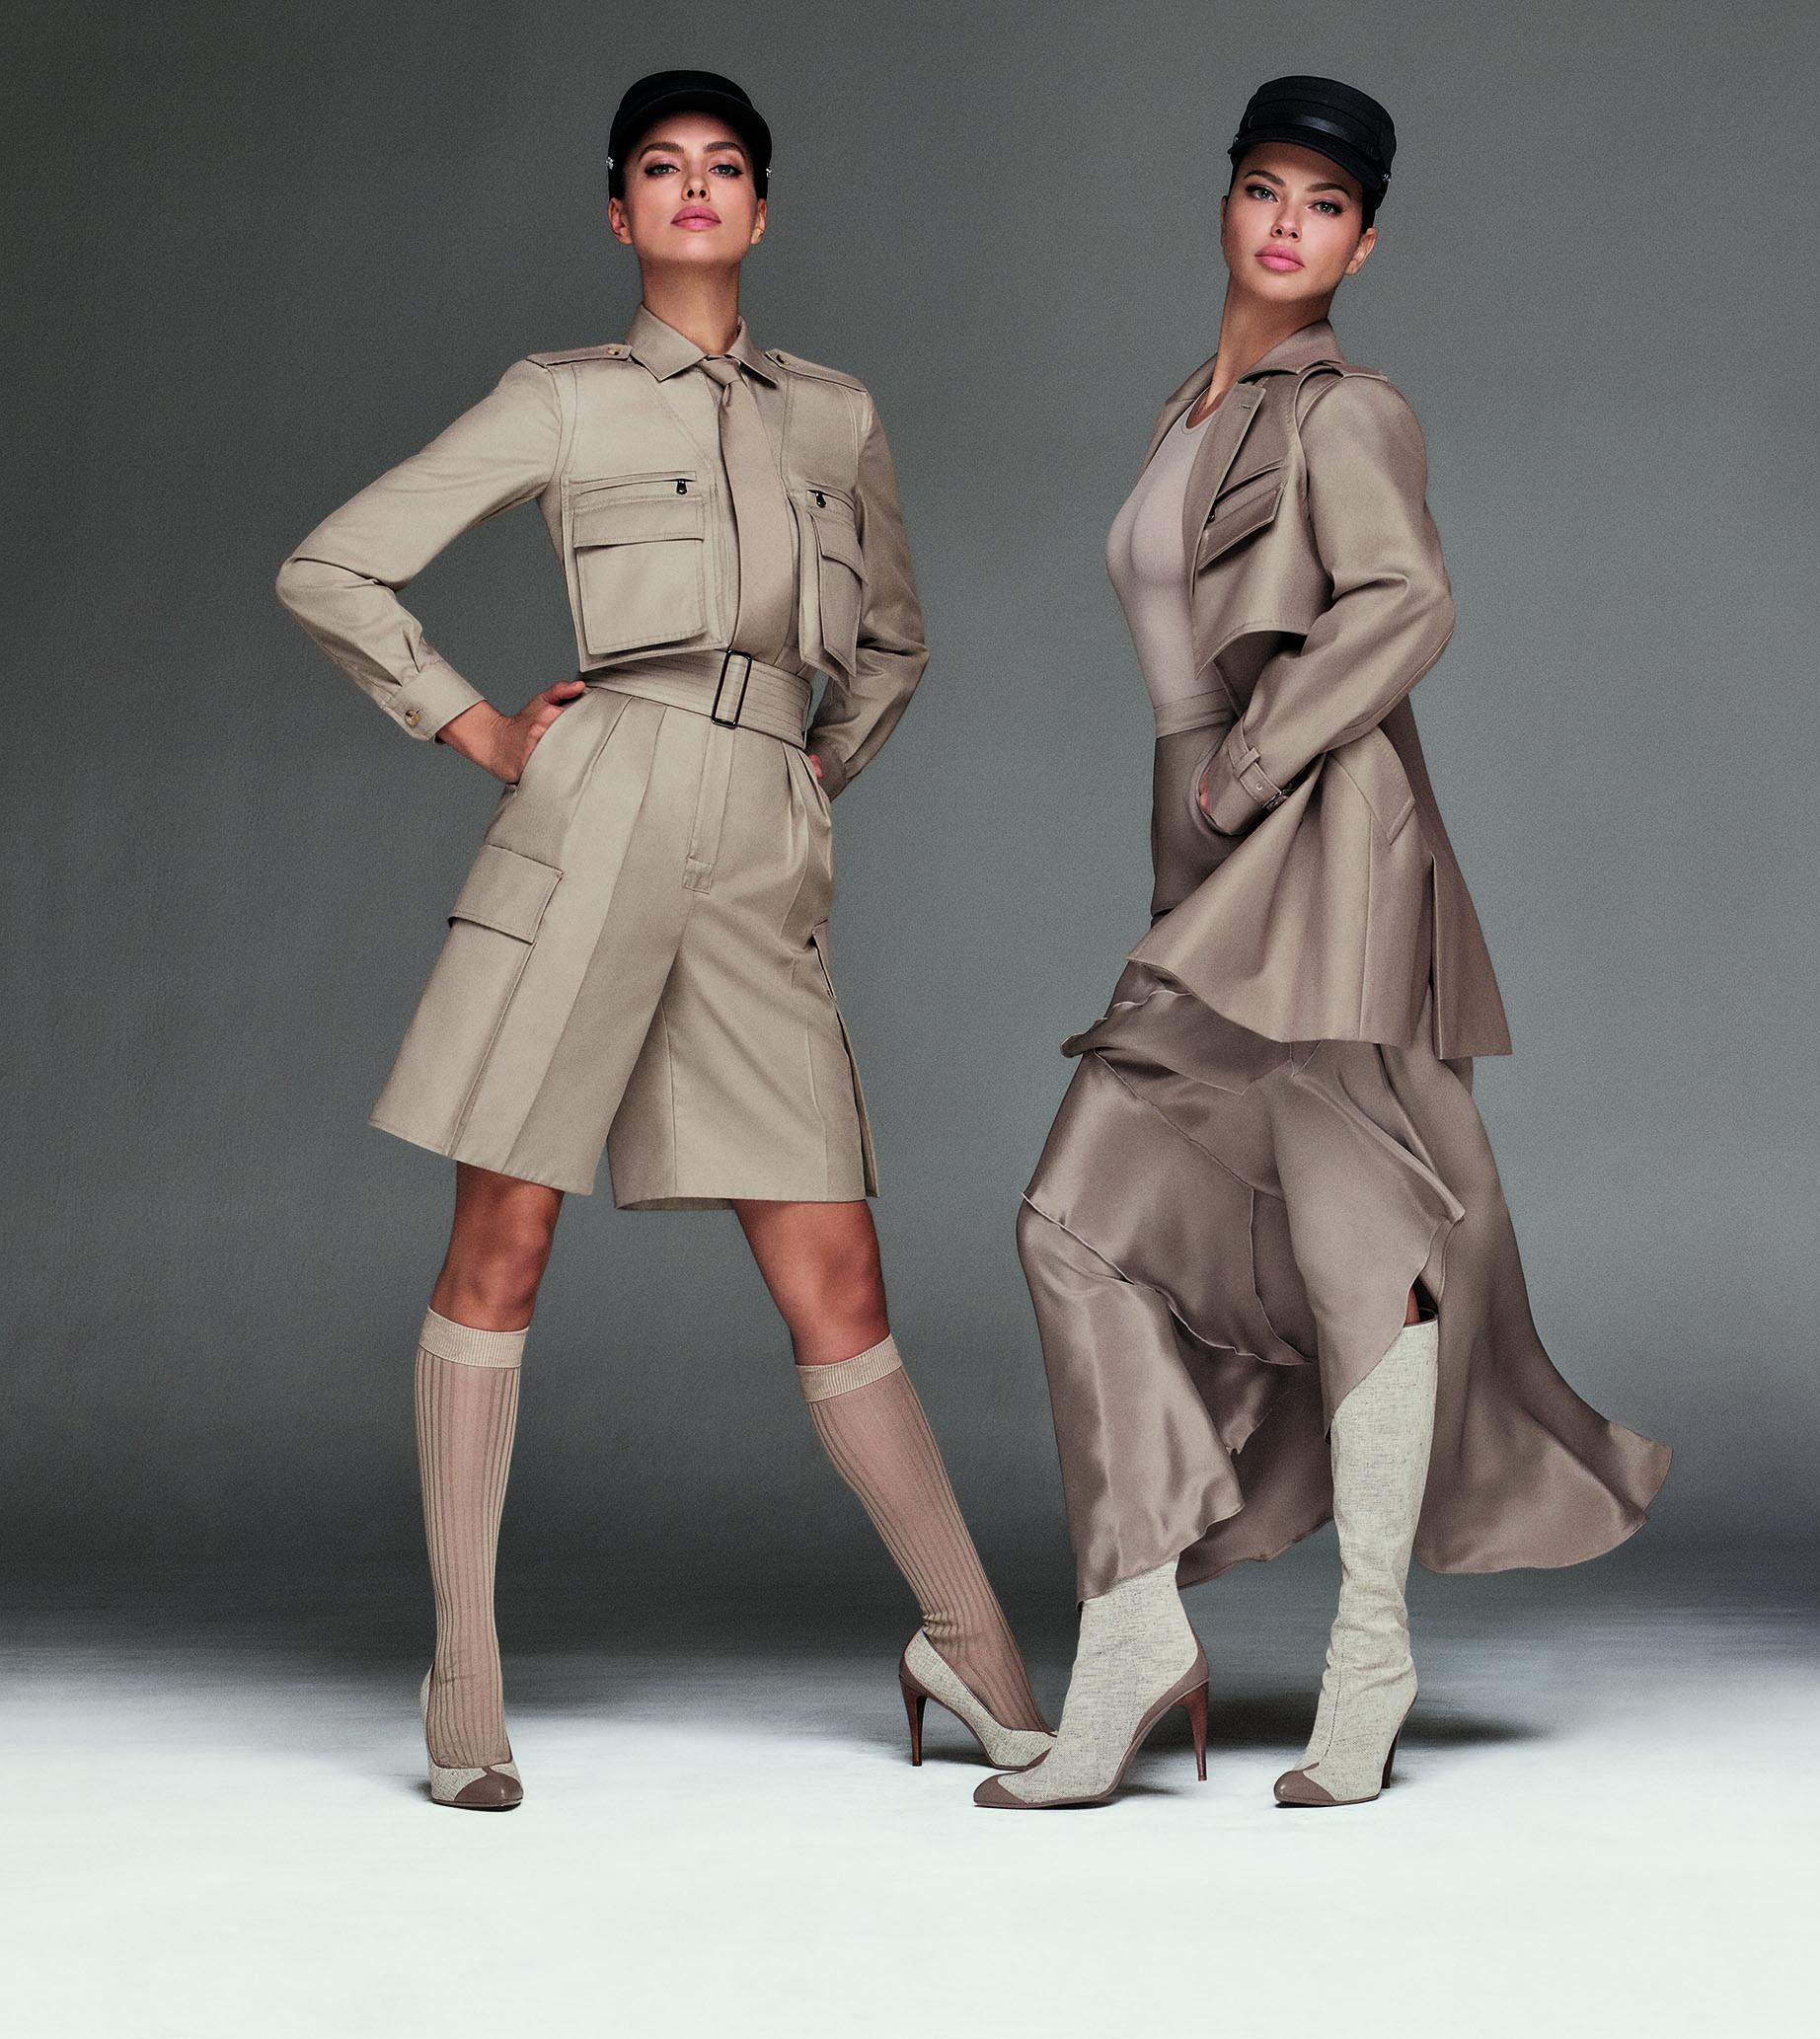 Max Mara Spring 2020 Fashion Ad Campaign Photos